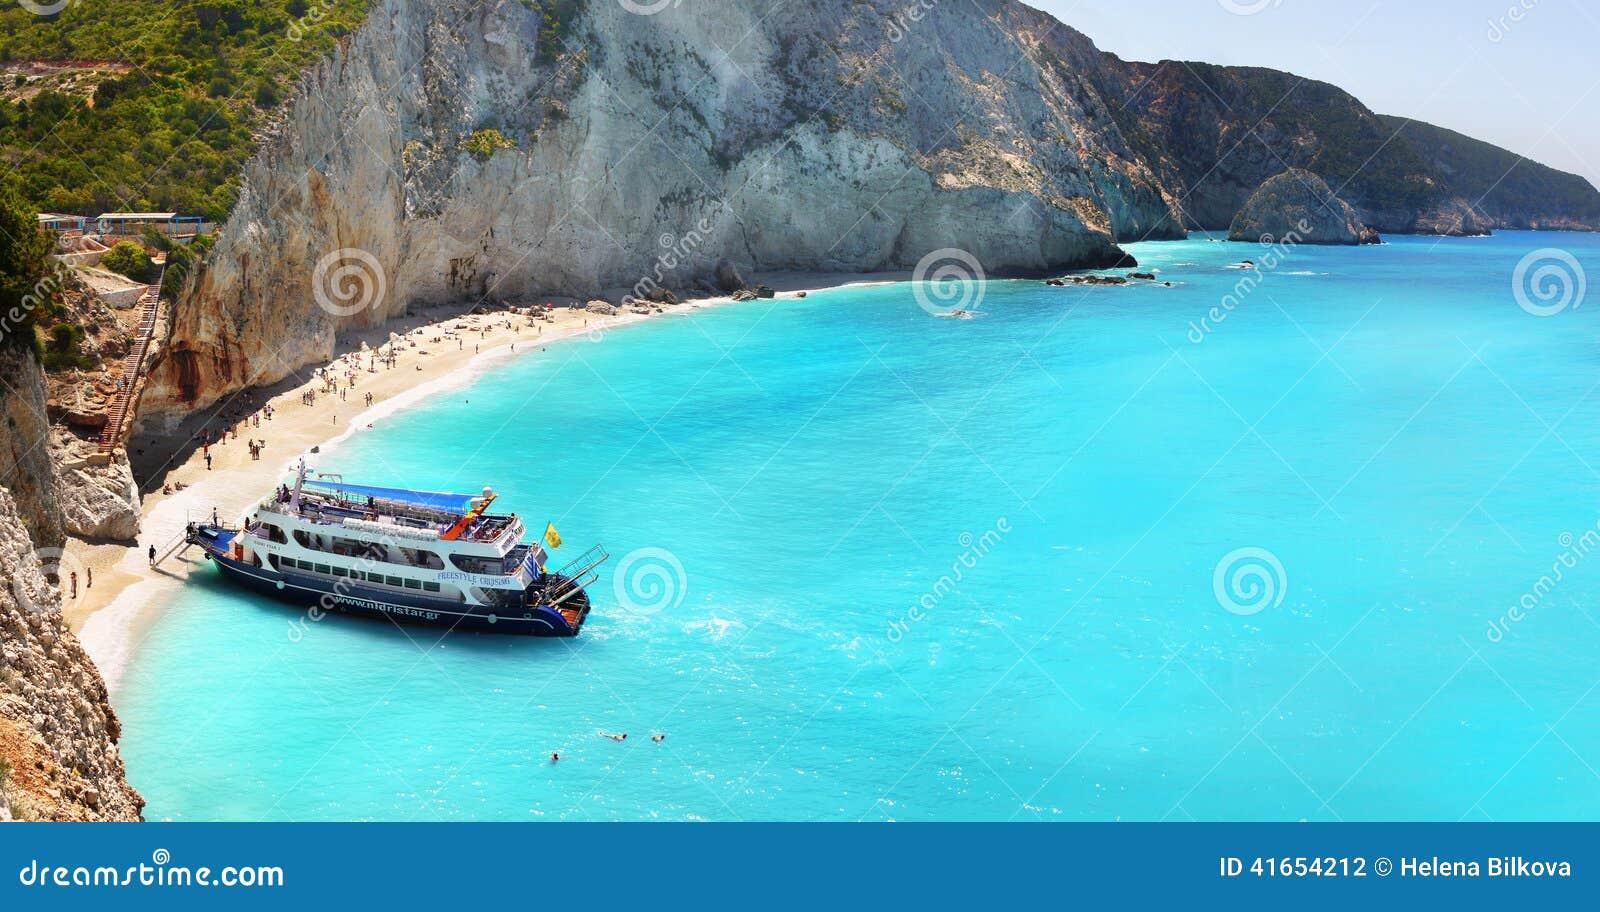 Porto Katsiki beach panorama, Lefkada, Greece